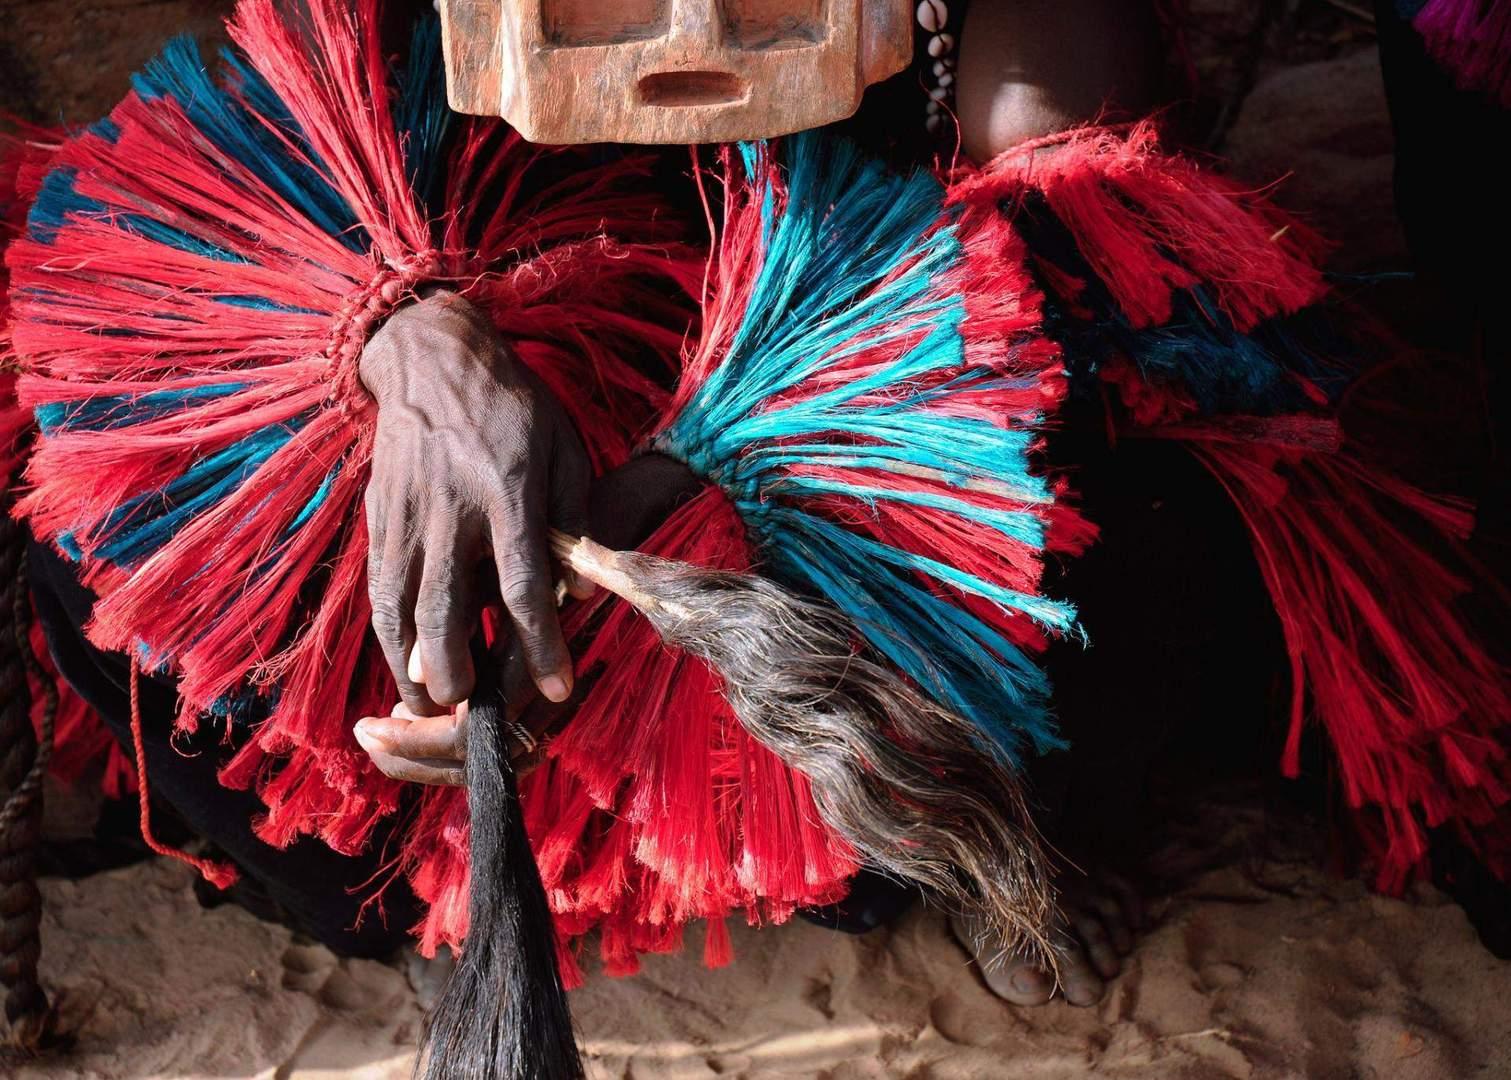 https://i2.wp.com/tripfreakz.com/galleries/the-mysterious-dogon-tribe-of-mali/dg05.jpg